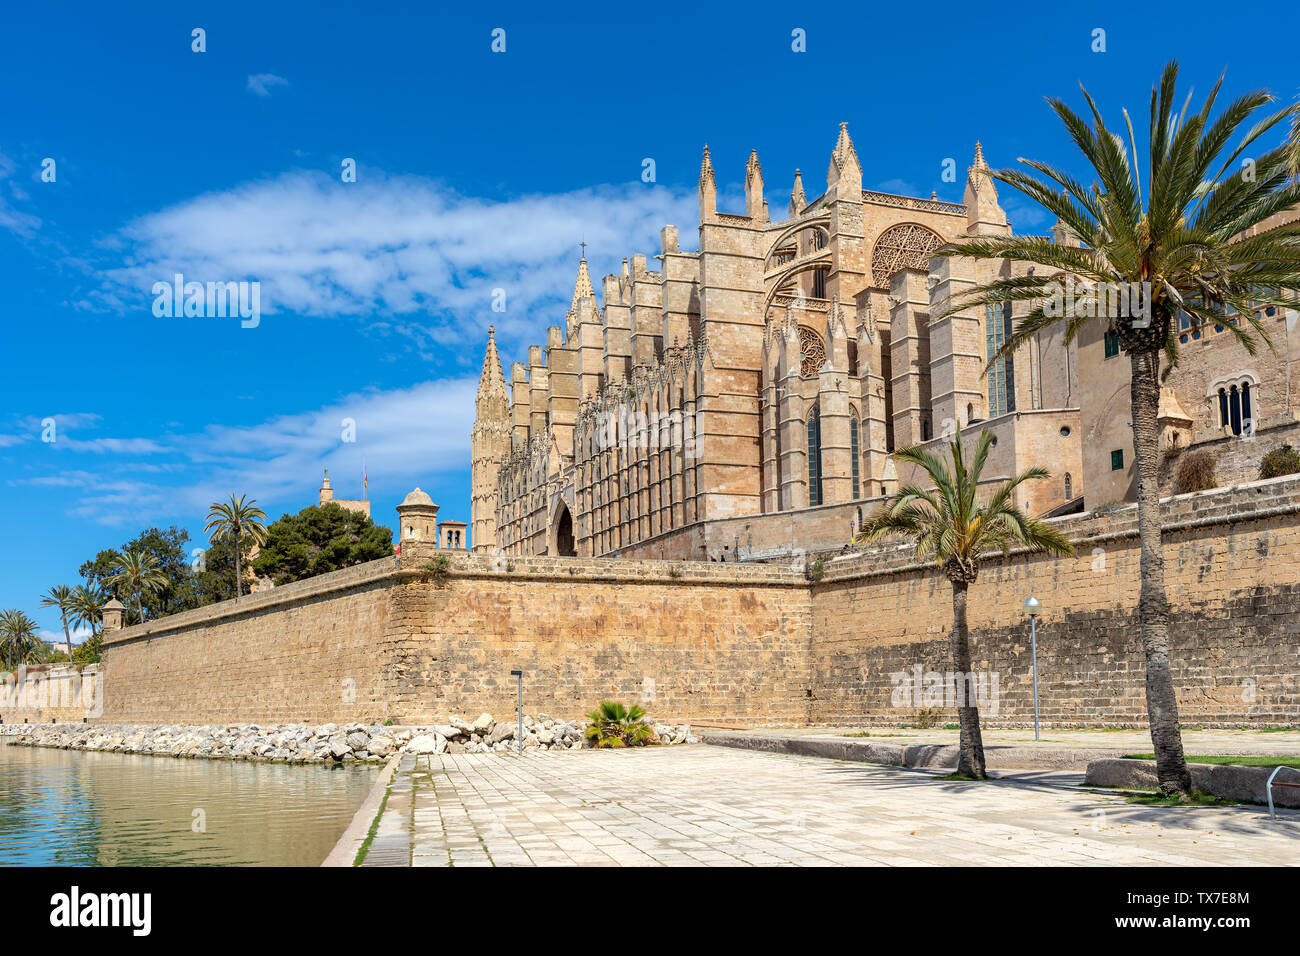 Famous Cathedral of Santa Maria under blues sky as seen from Parc de la Mar in Palma de Mallorca, Spain. - Stock Image